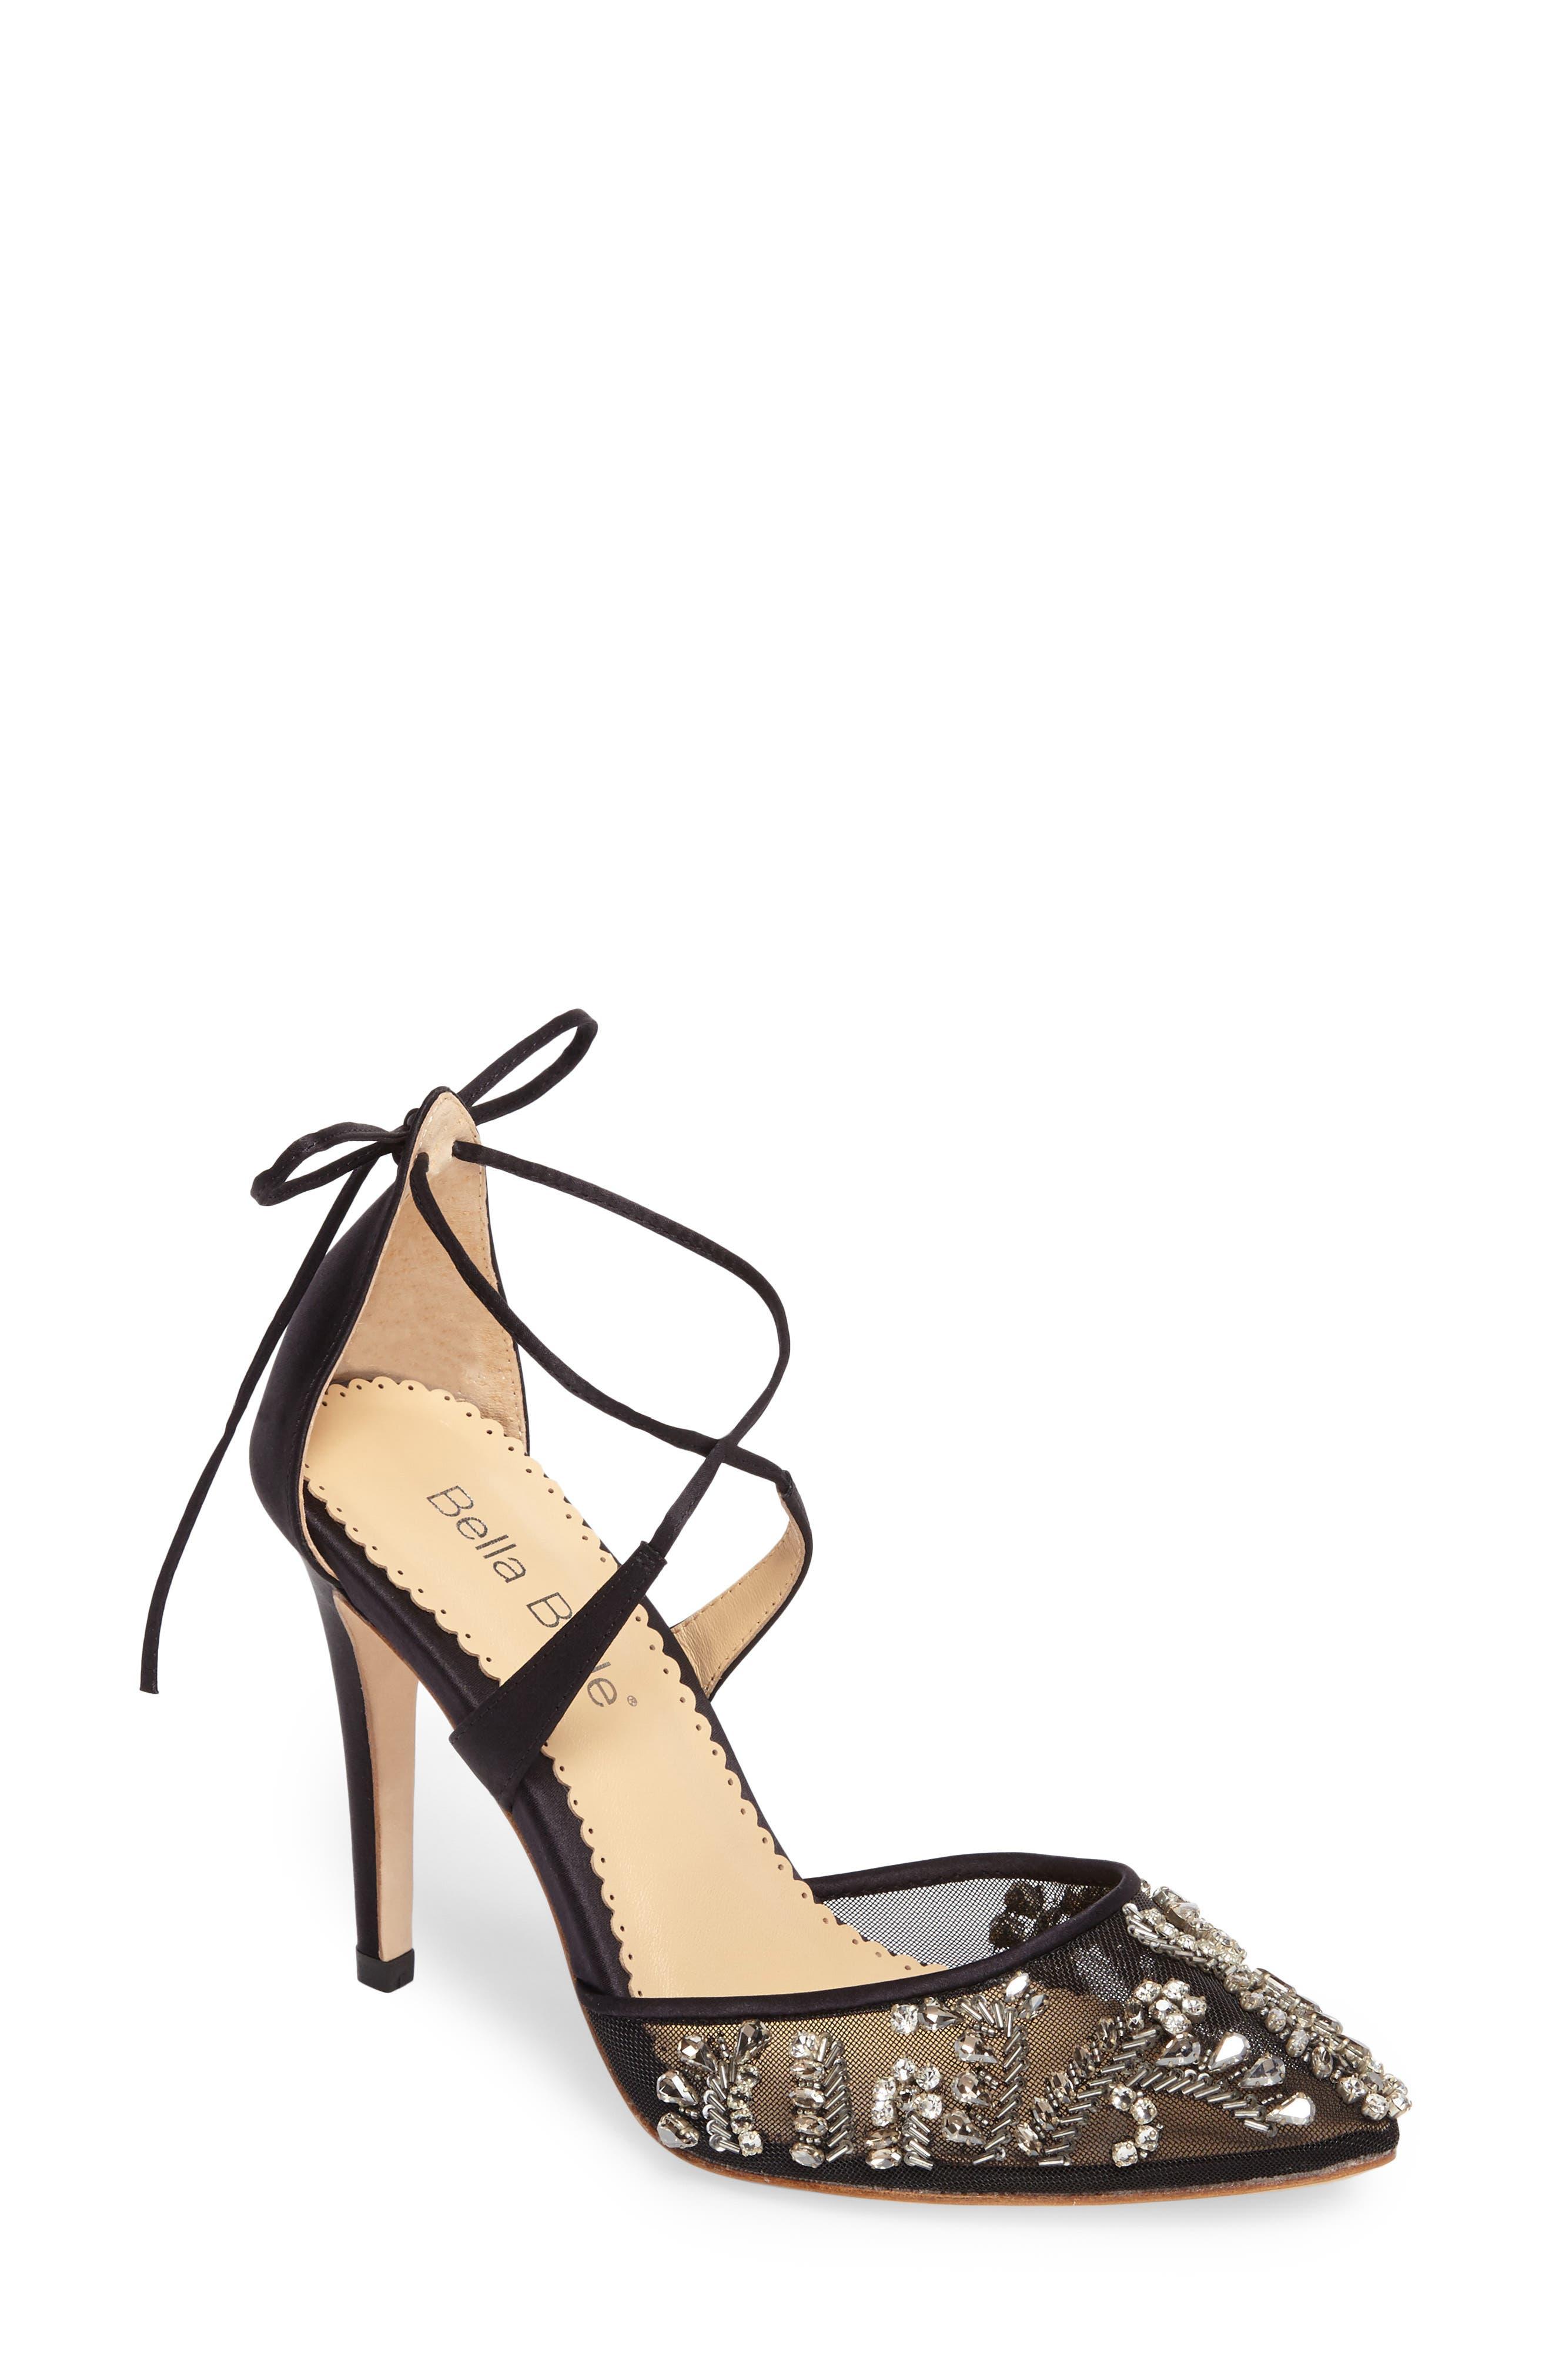 Florence Embellished Bow Sandal,                             Main thumbnail 1, color,                             001